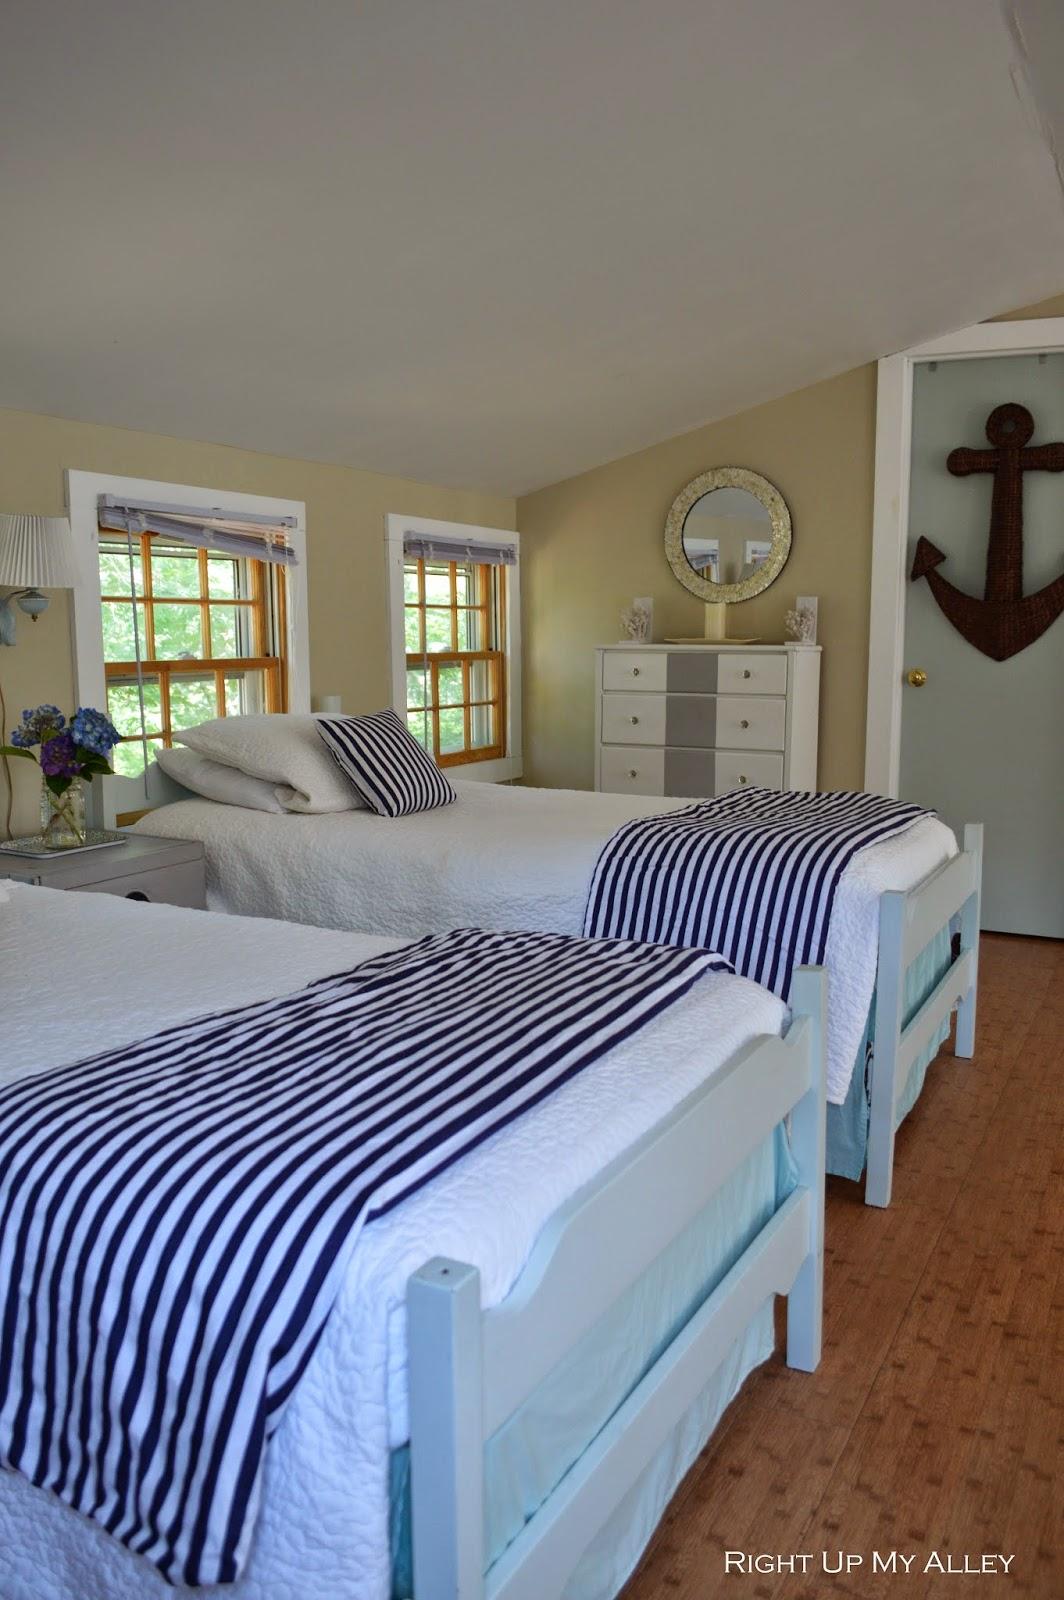 Hgtv Dream Home Paint Colors | # Home Painting Ideas